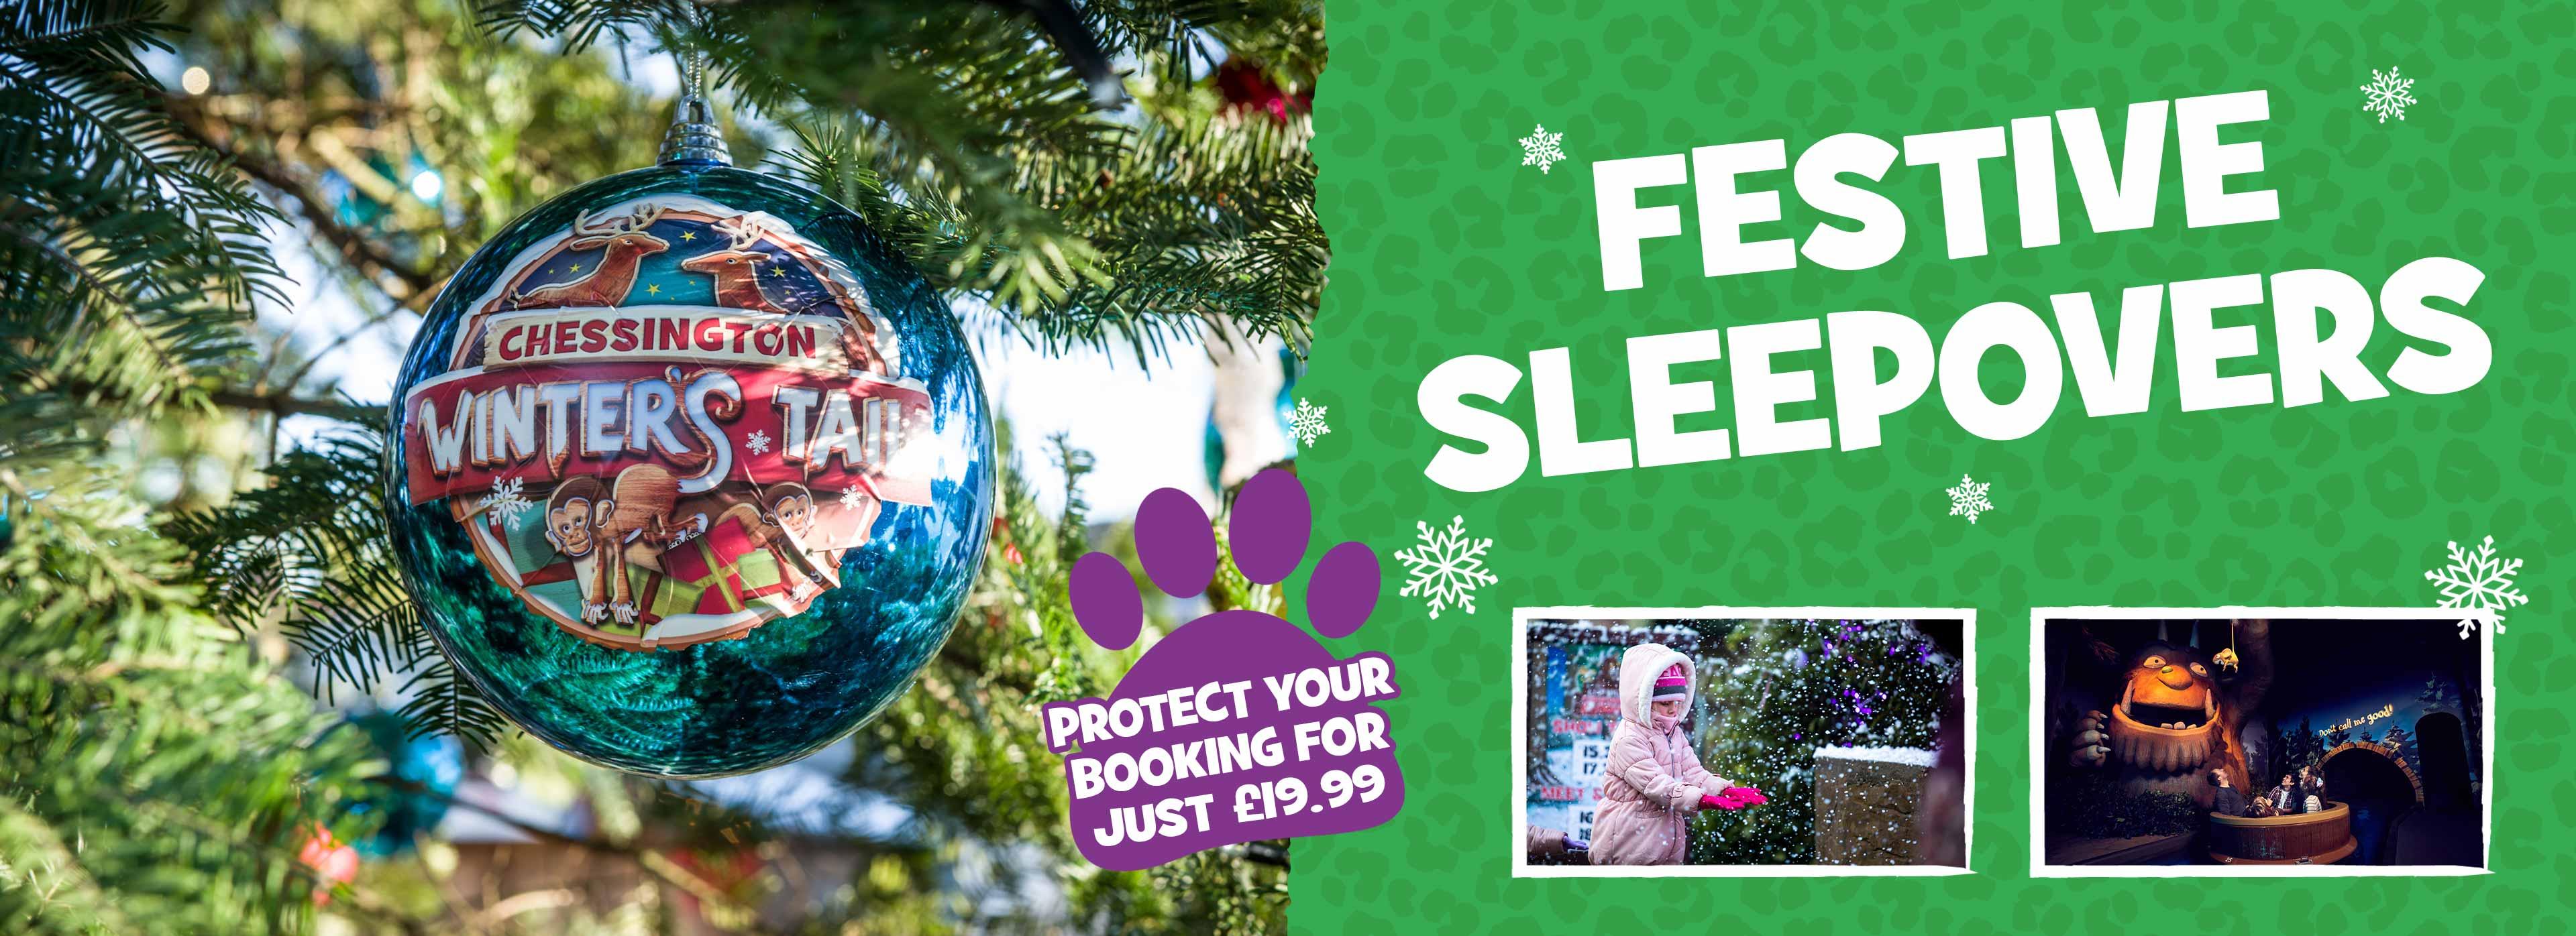 Festive Sleepovers 2020 at Chessington World of Adventures Resort